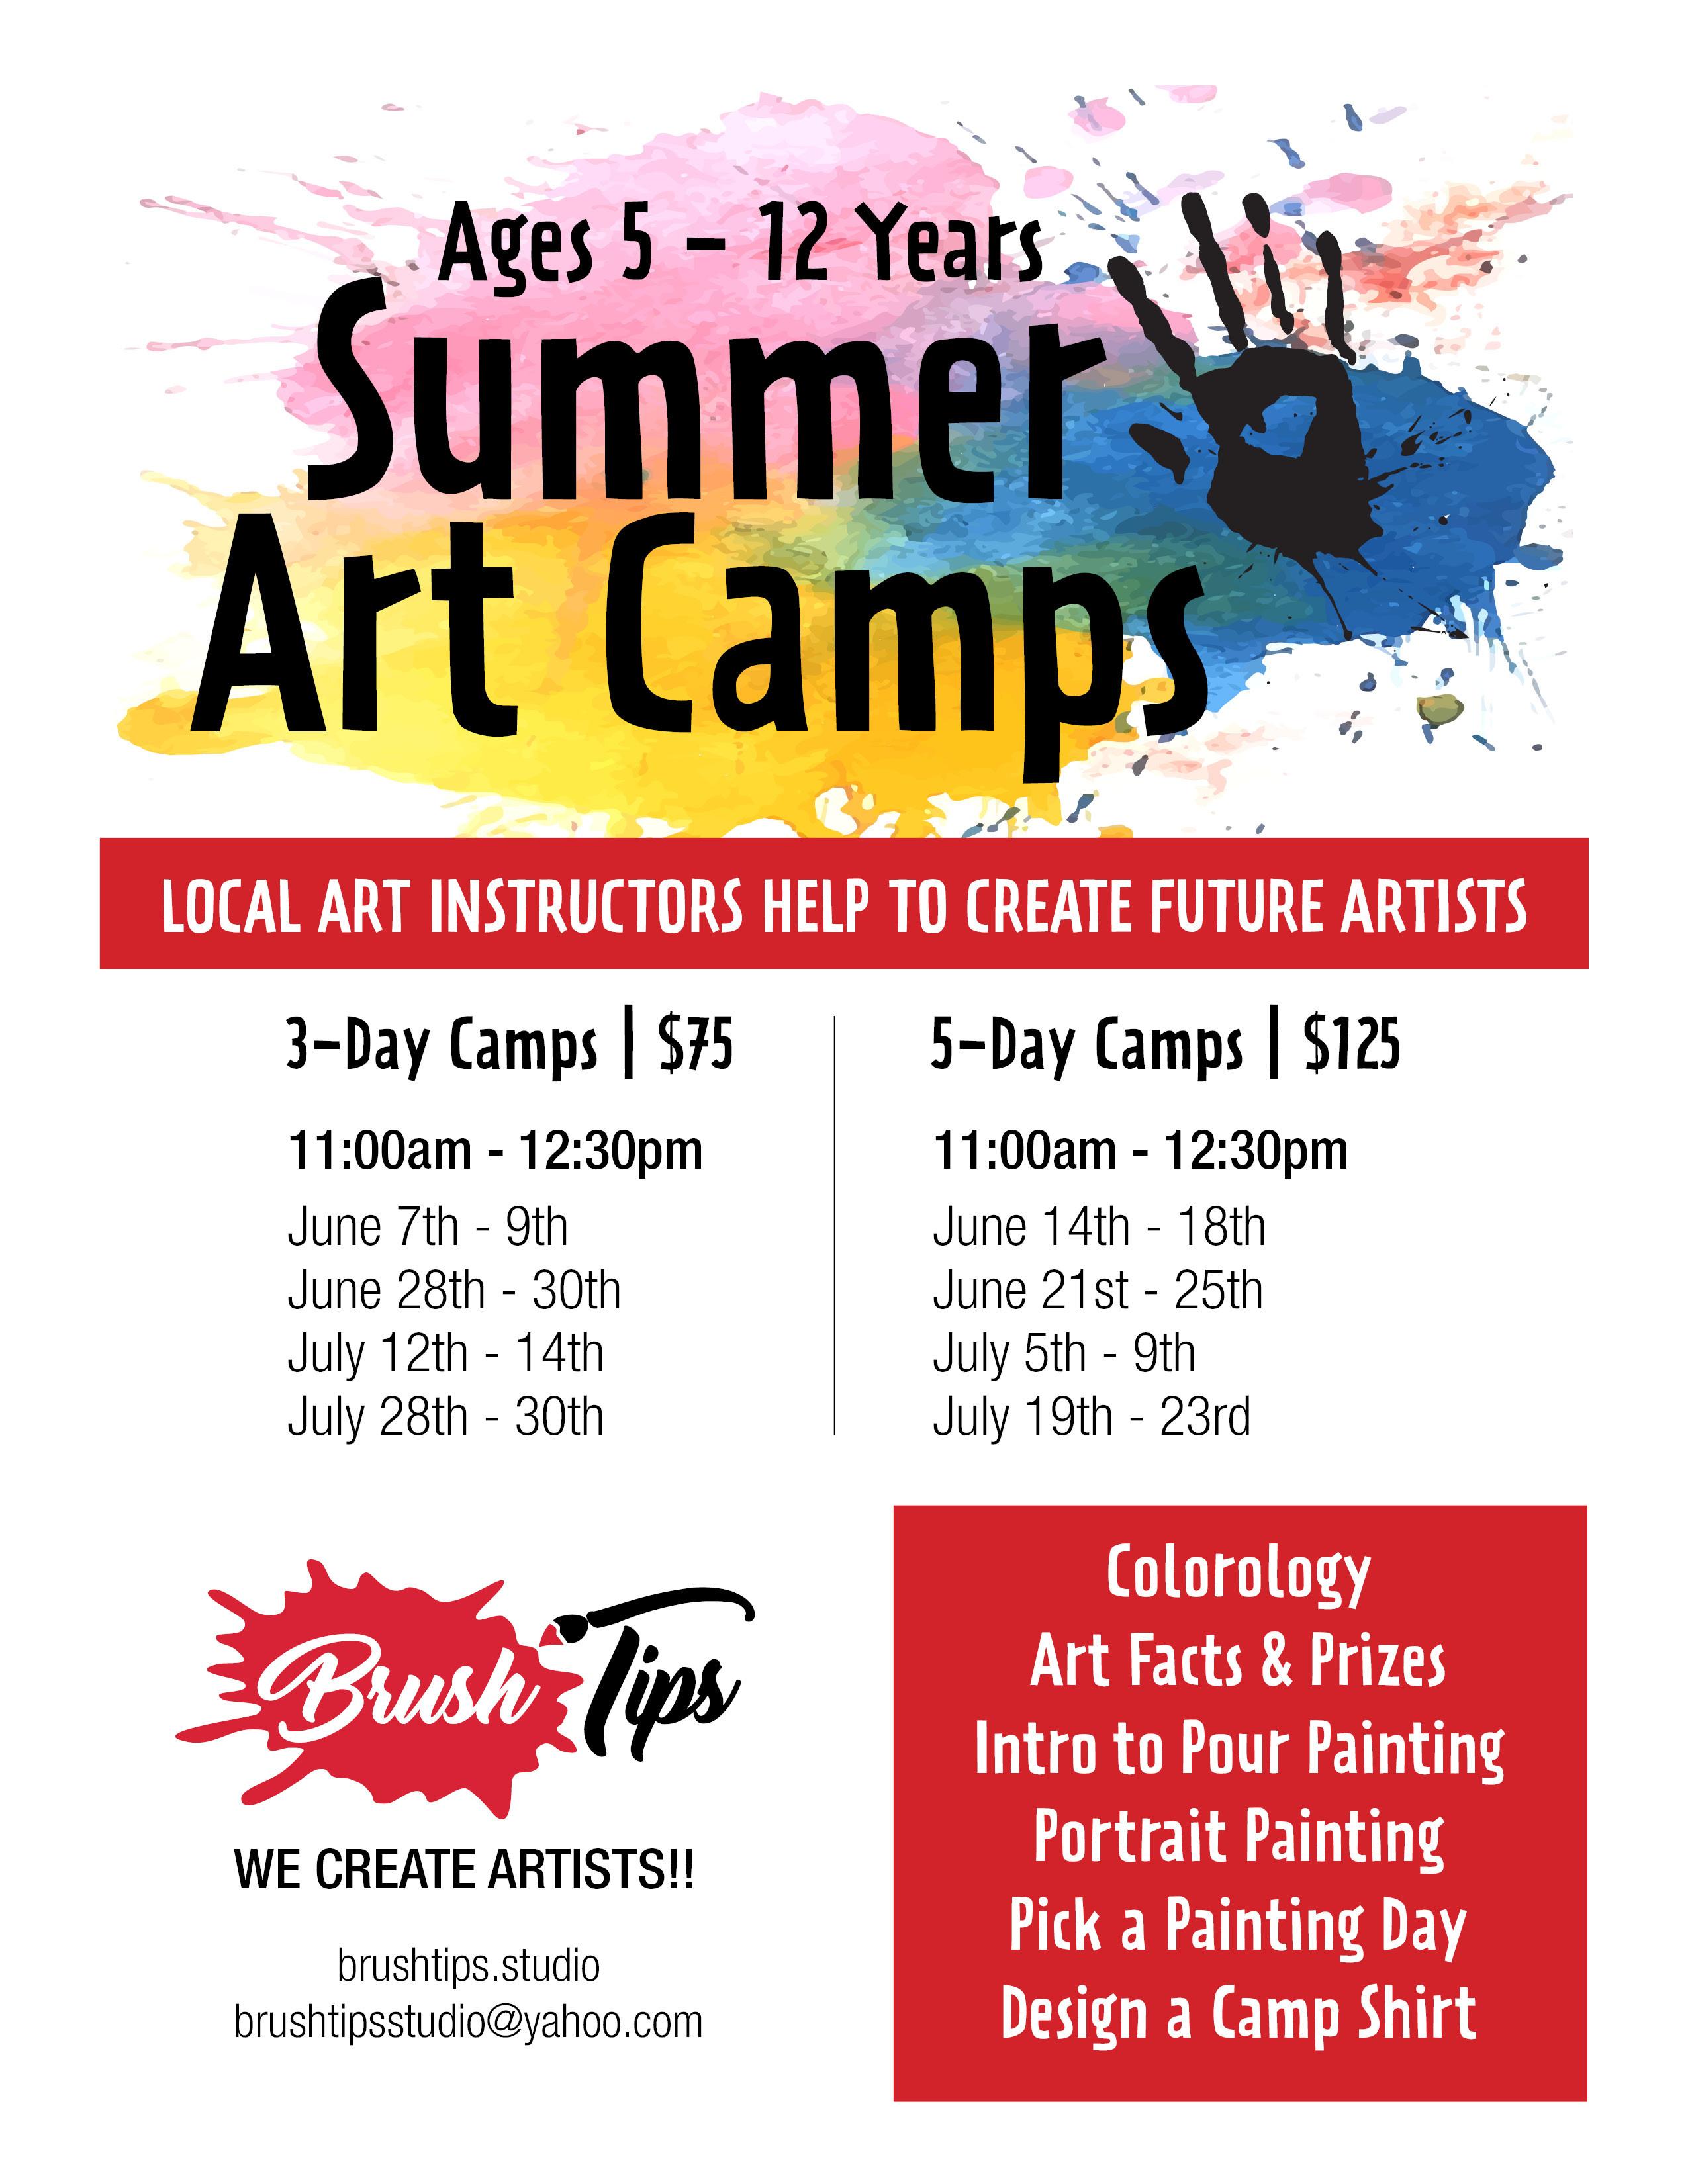 Drop-in Summer Art Camp